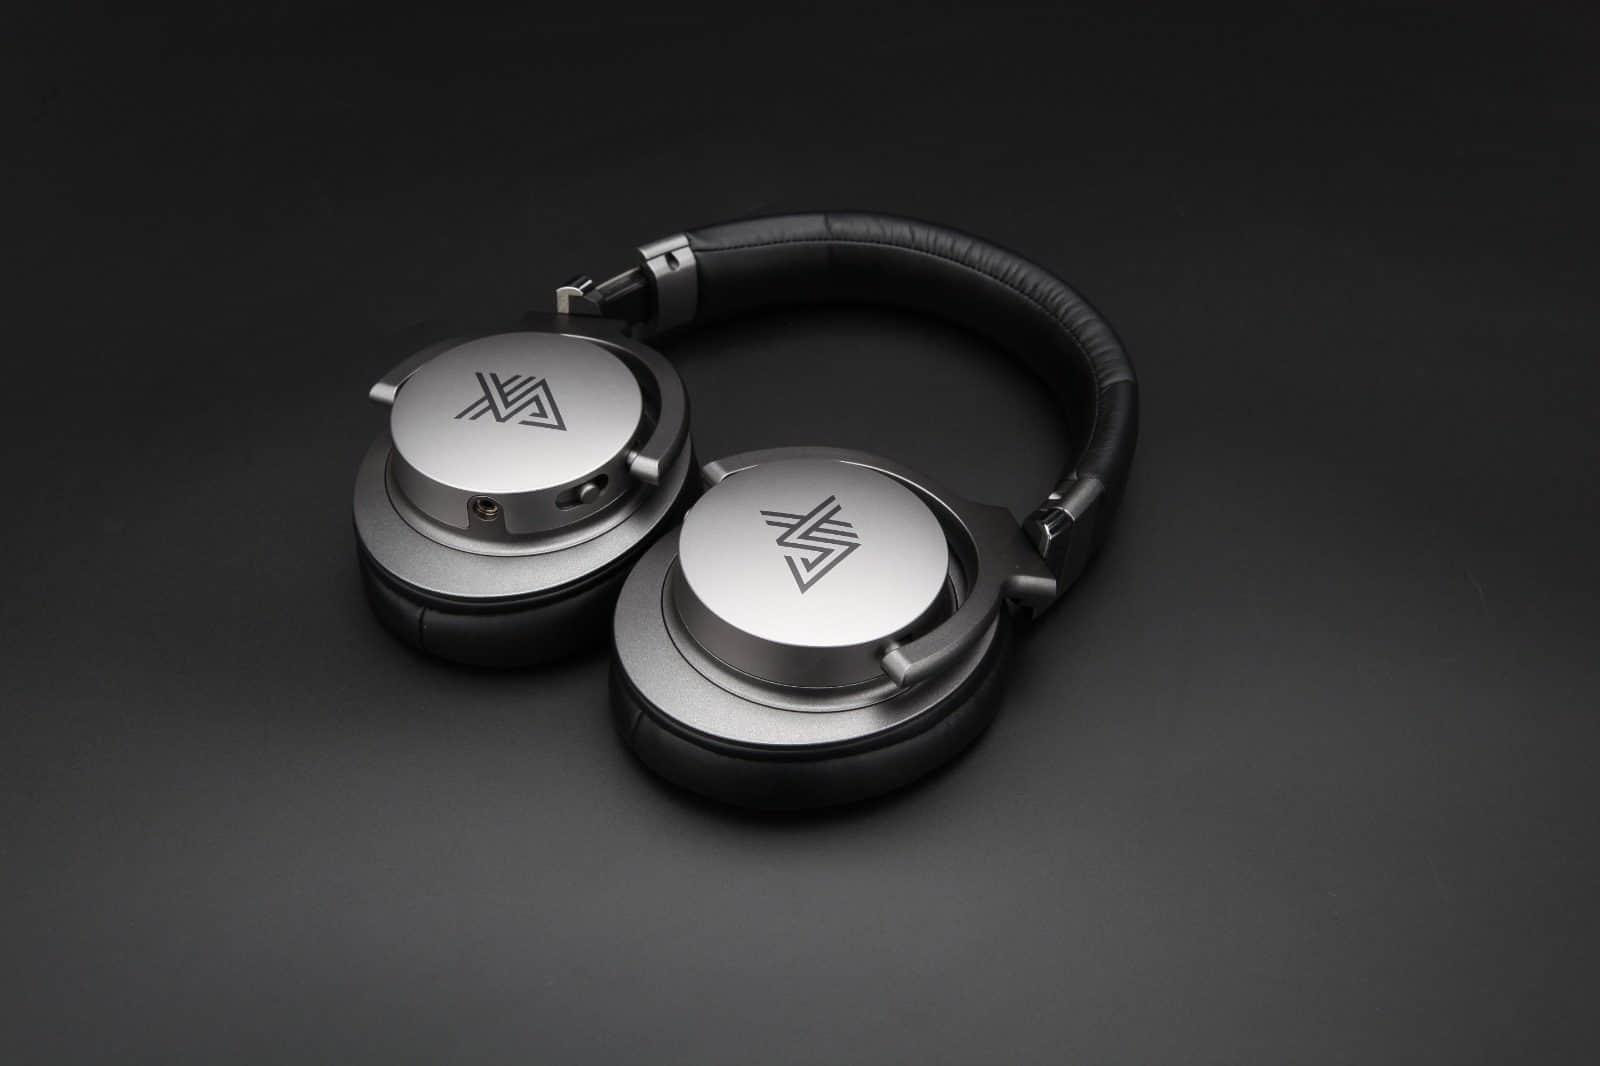 XANOVA Juturna-U Gaming Headset - Hardware